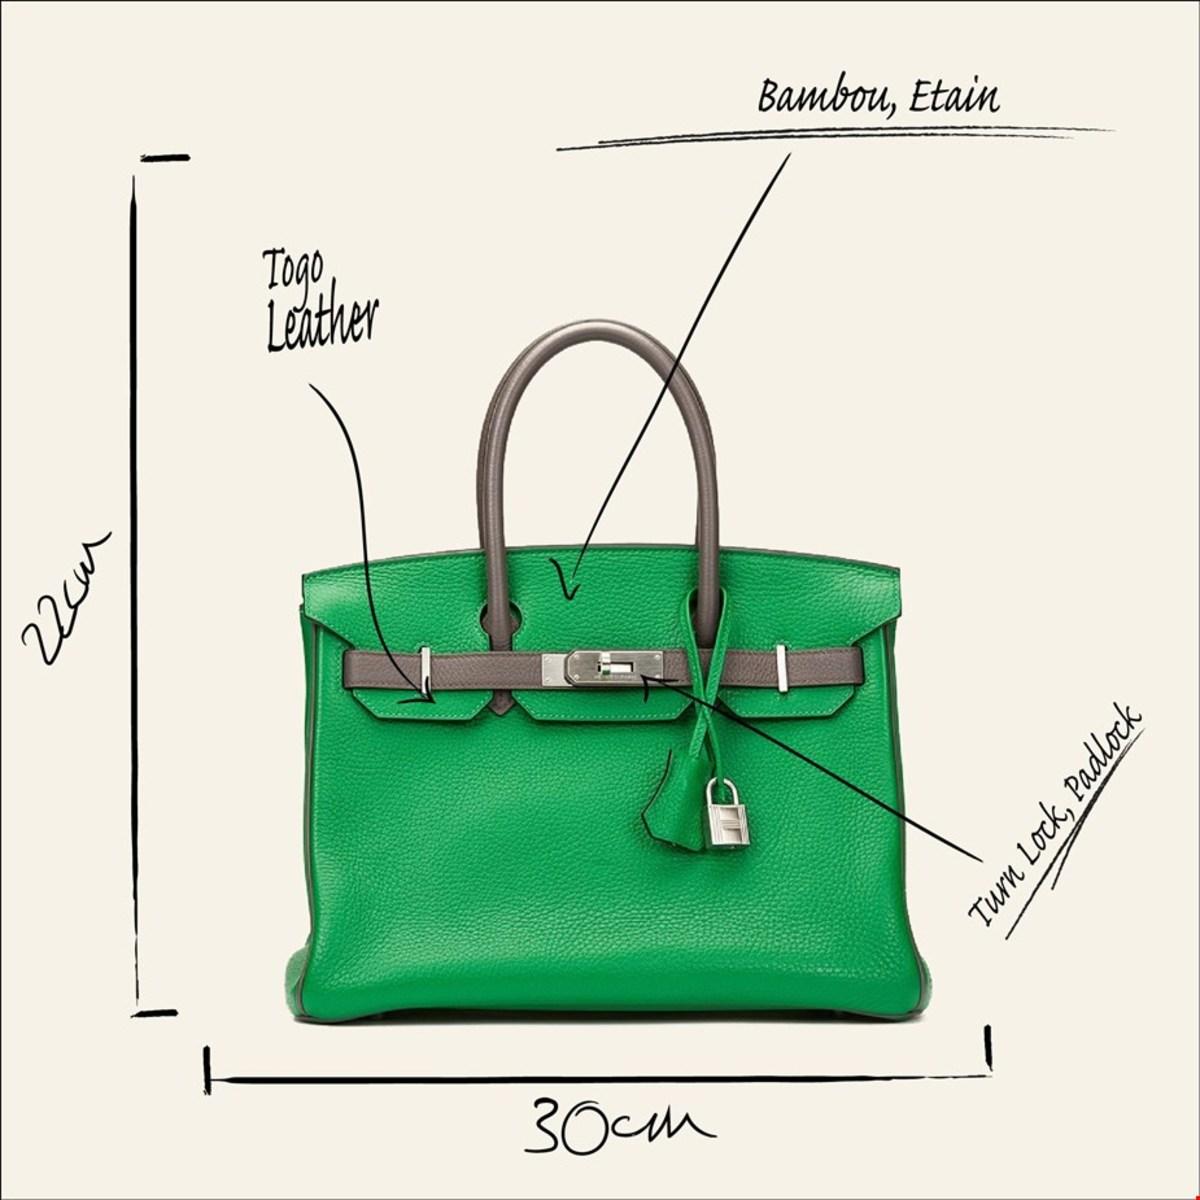 Hermès Birkin Bag, the Ultimate Timelessly Classic Handbag!